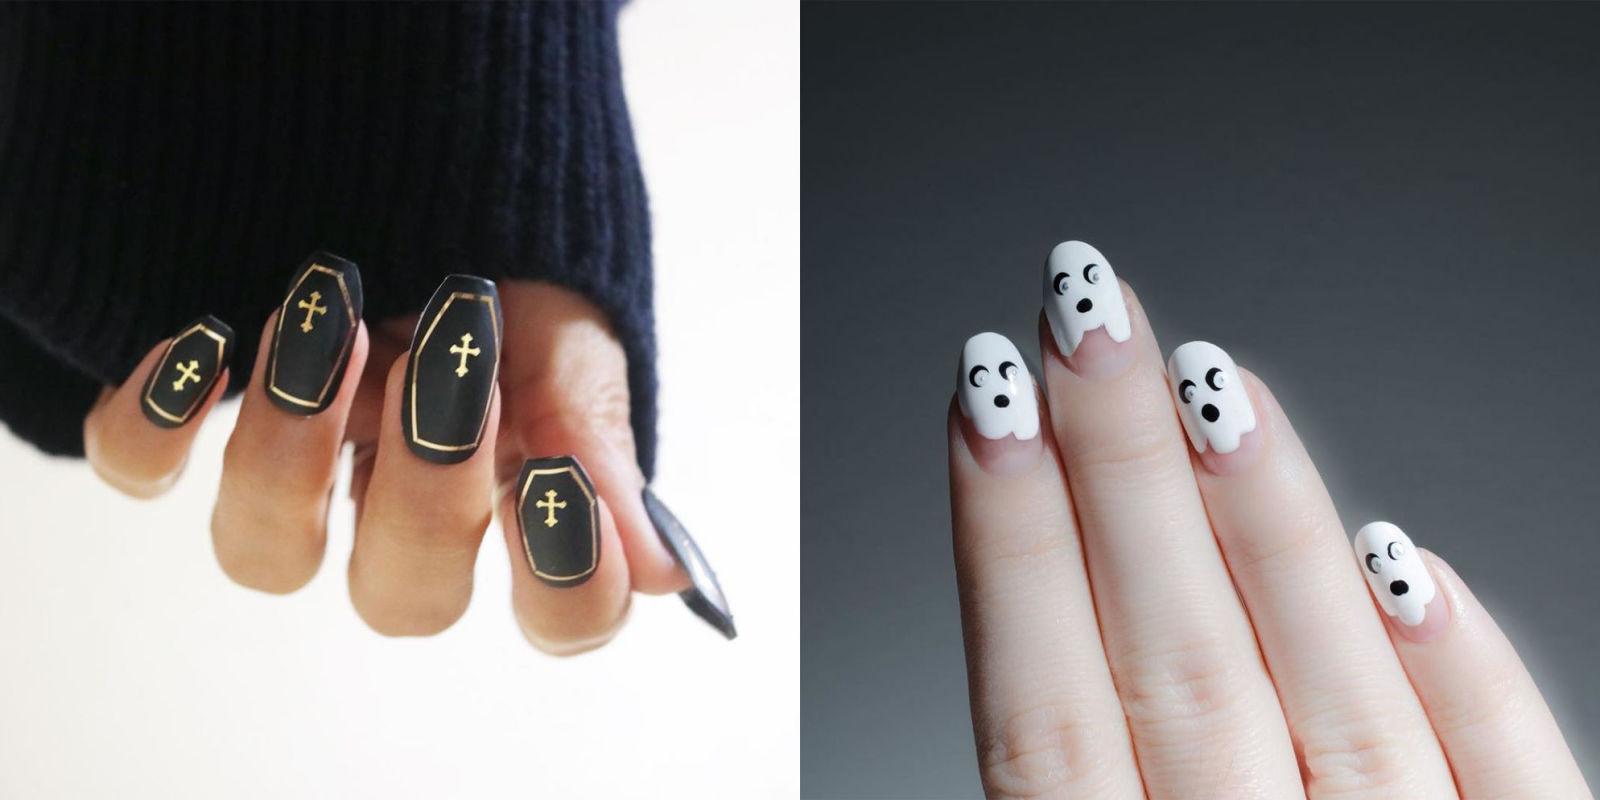 13 Halloween Nail Art Ideas for 2017 - Cute Nail Designs for ...